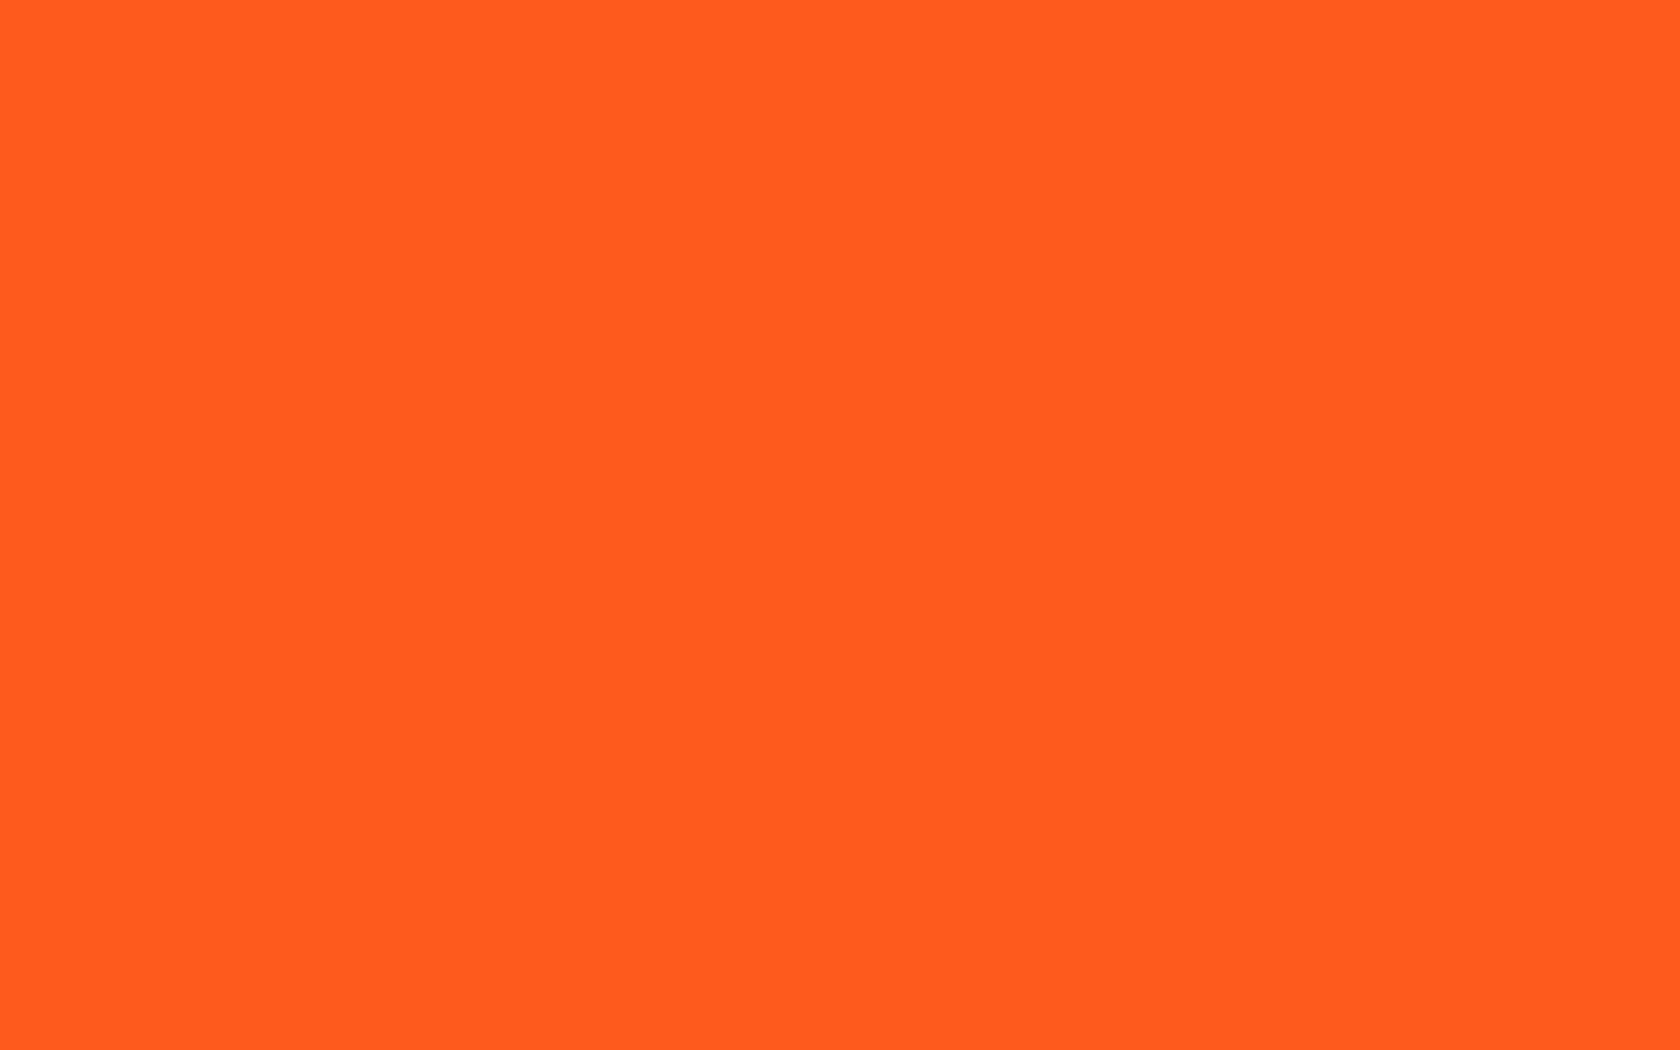 1680x1050 Giants Orange Solid Color Background